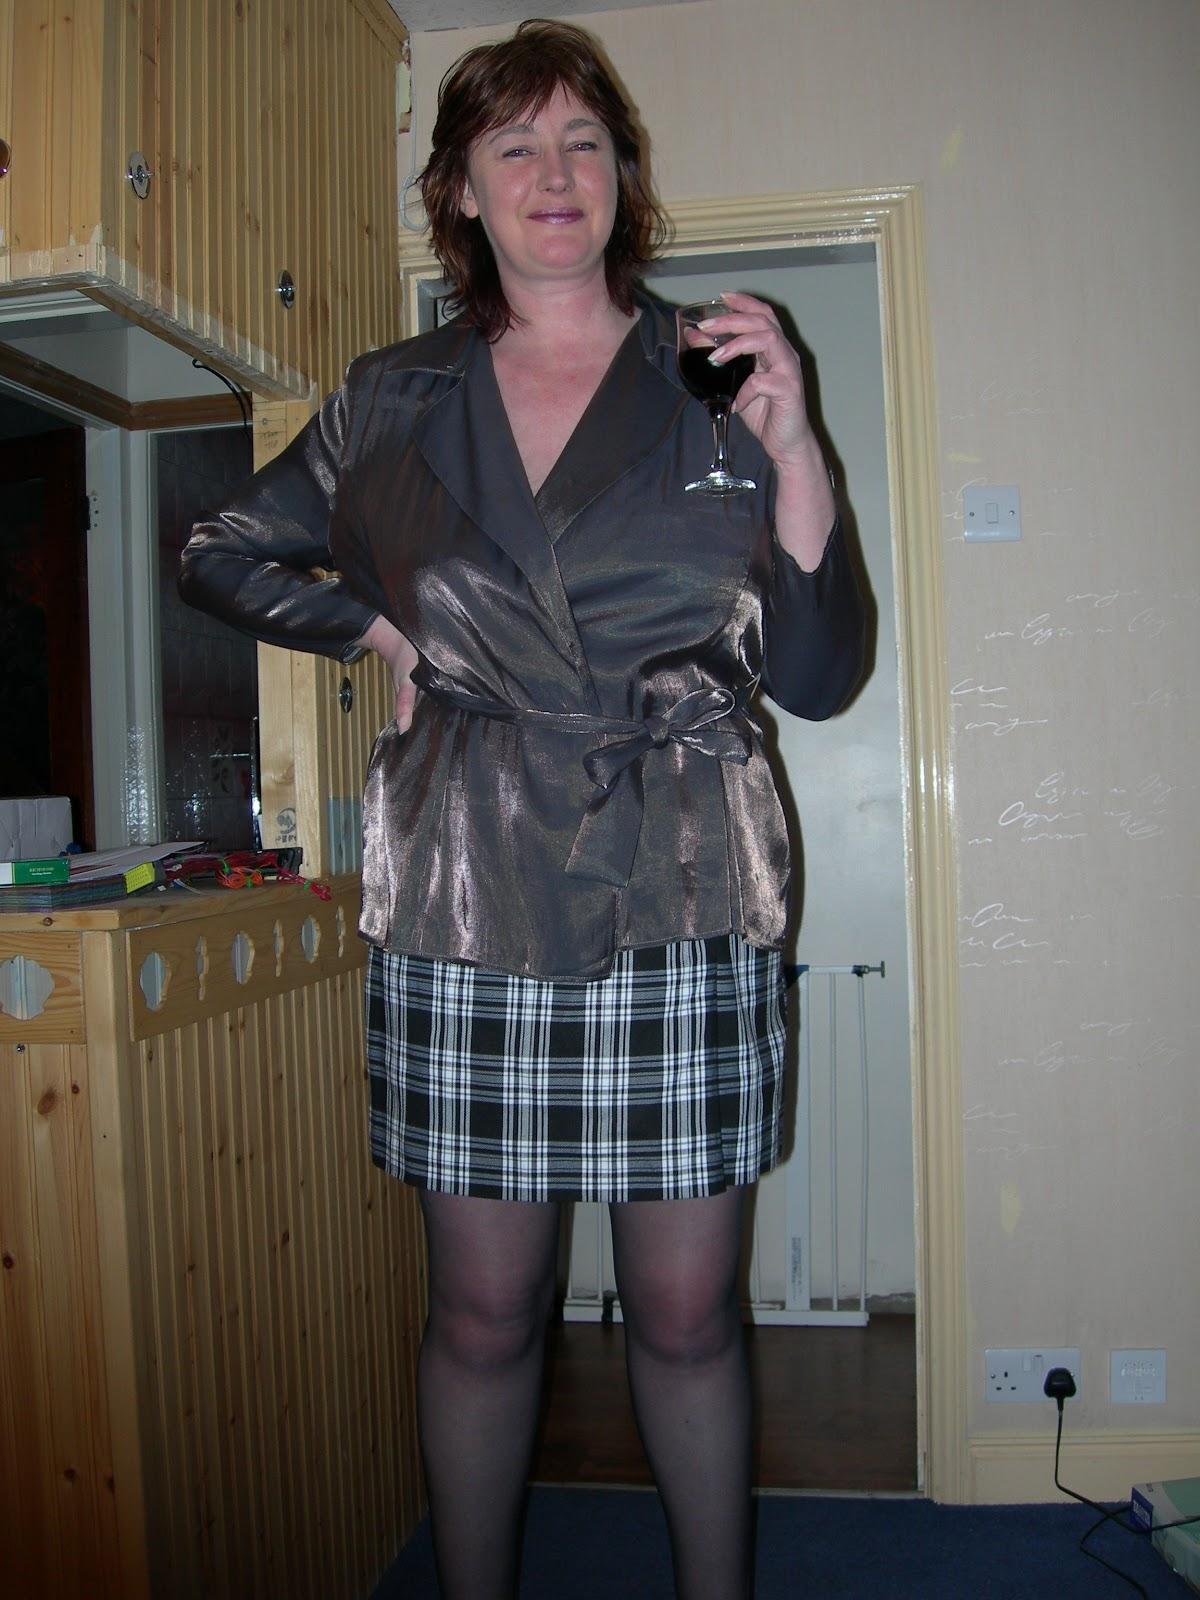 sockings in pantyhose ladies Mature and